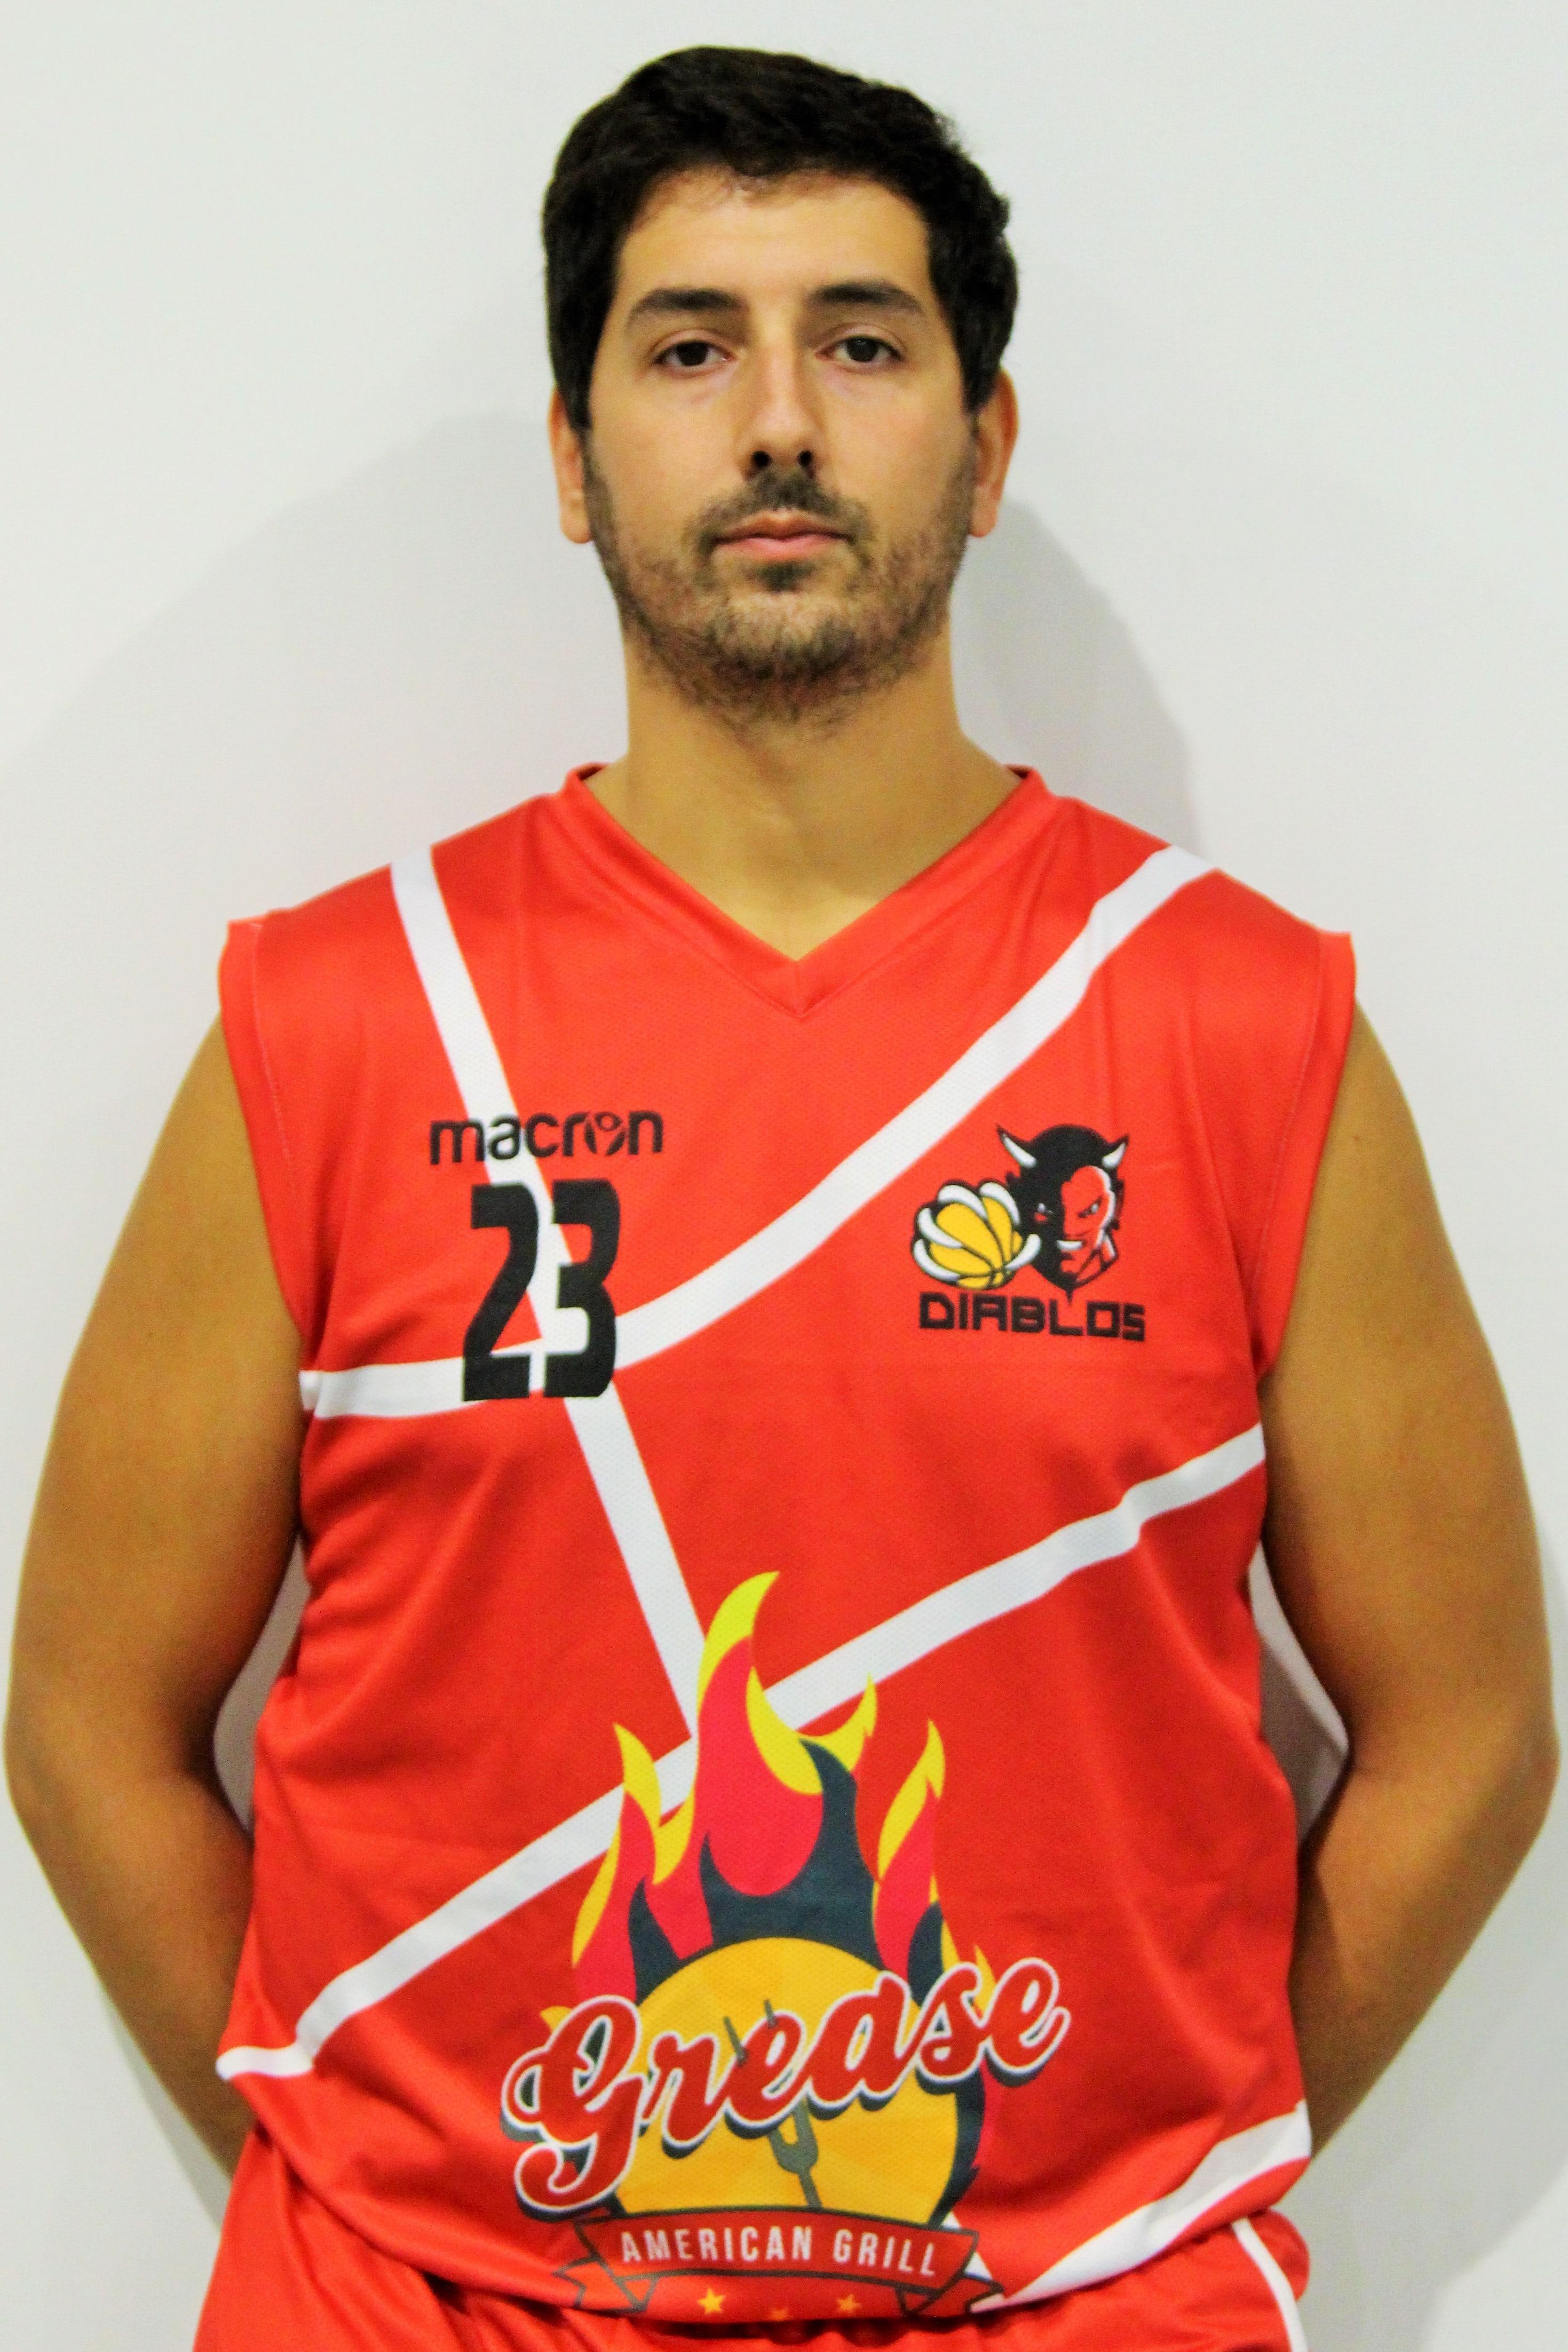 Matteo Verdoliva